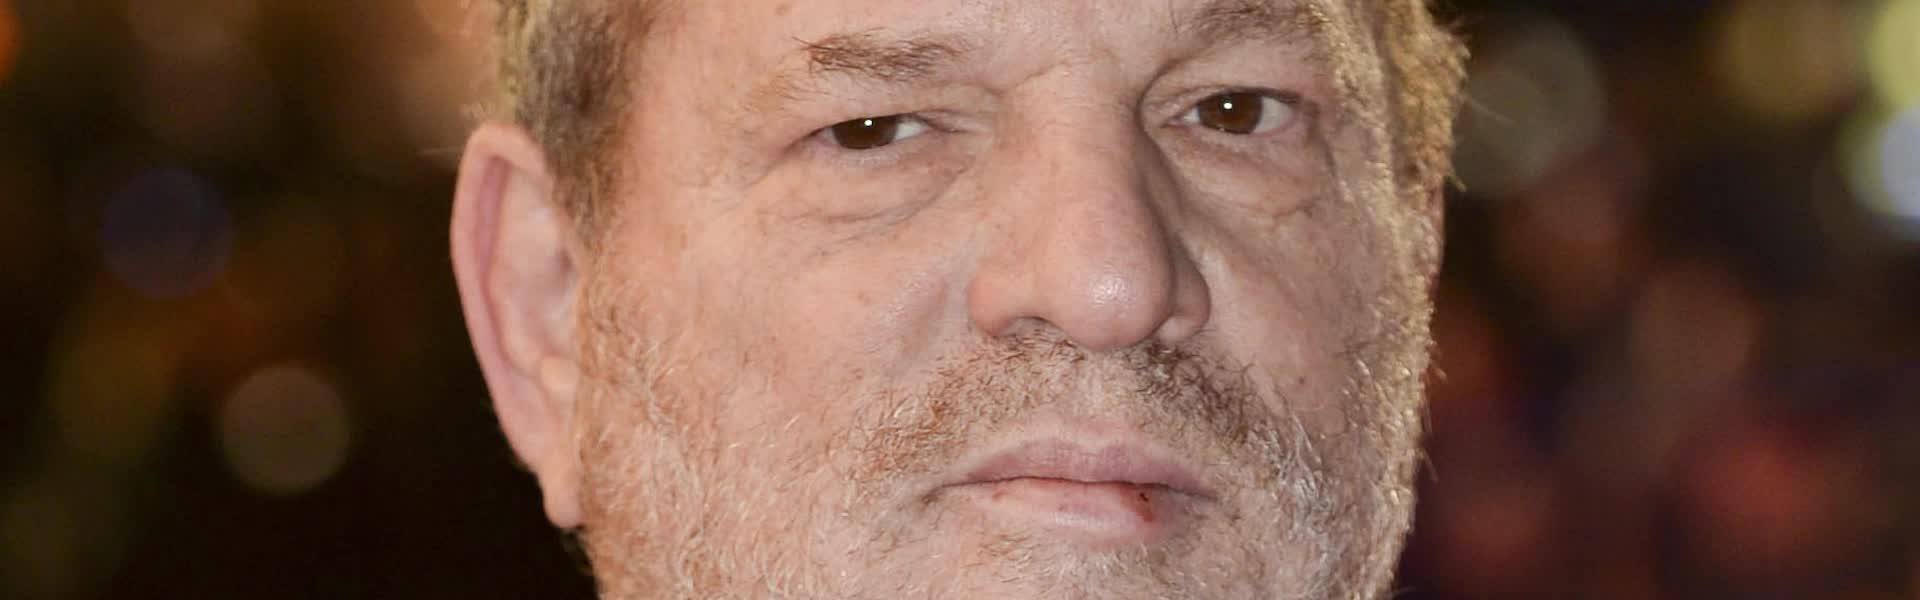 Harvey Weinstein - El Palomitrón